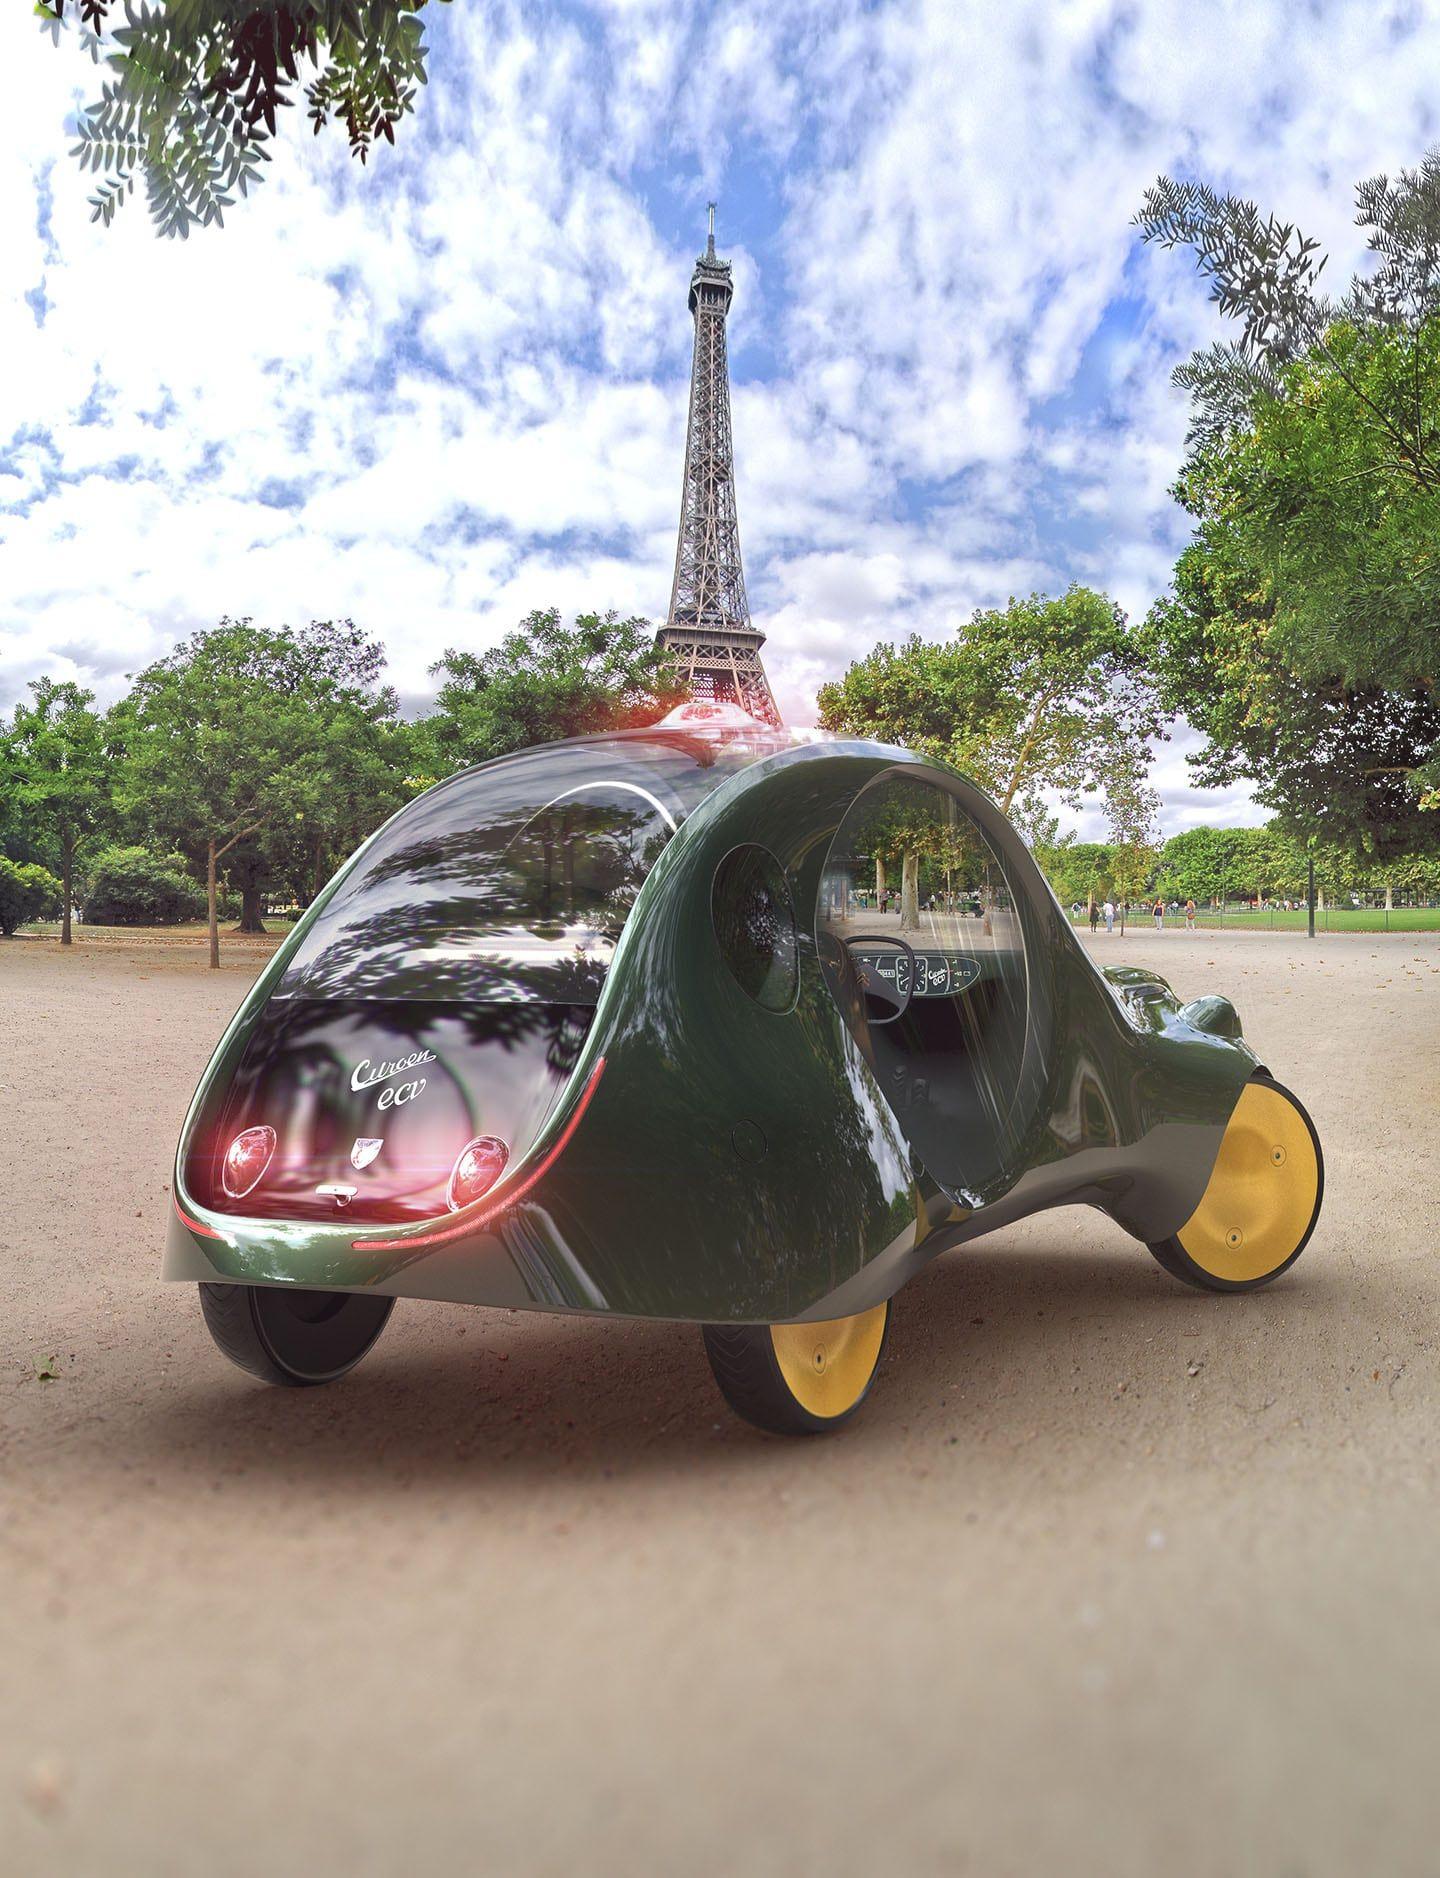 Citroen Ecv Taxi Concept Cars Vintage Citroen Concept Cars